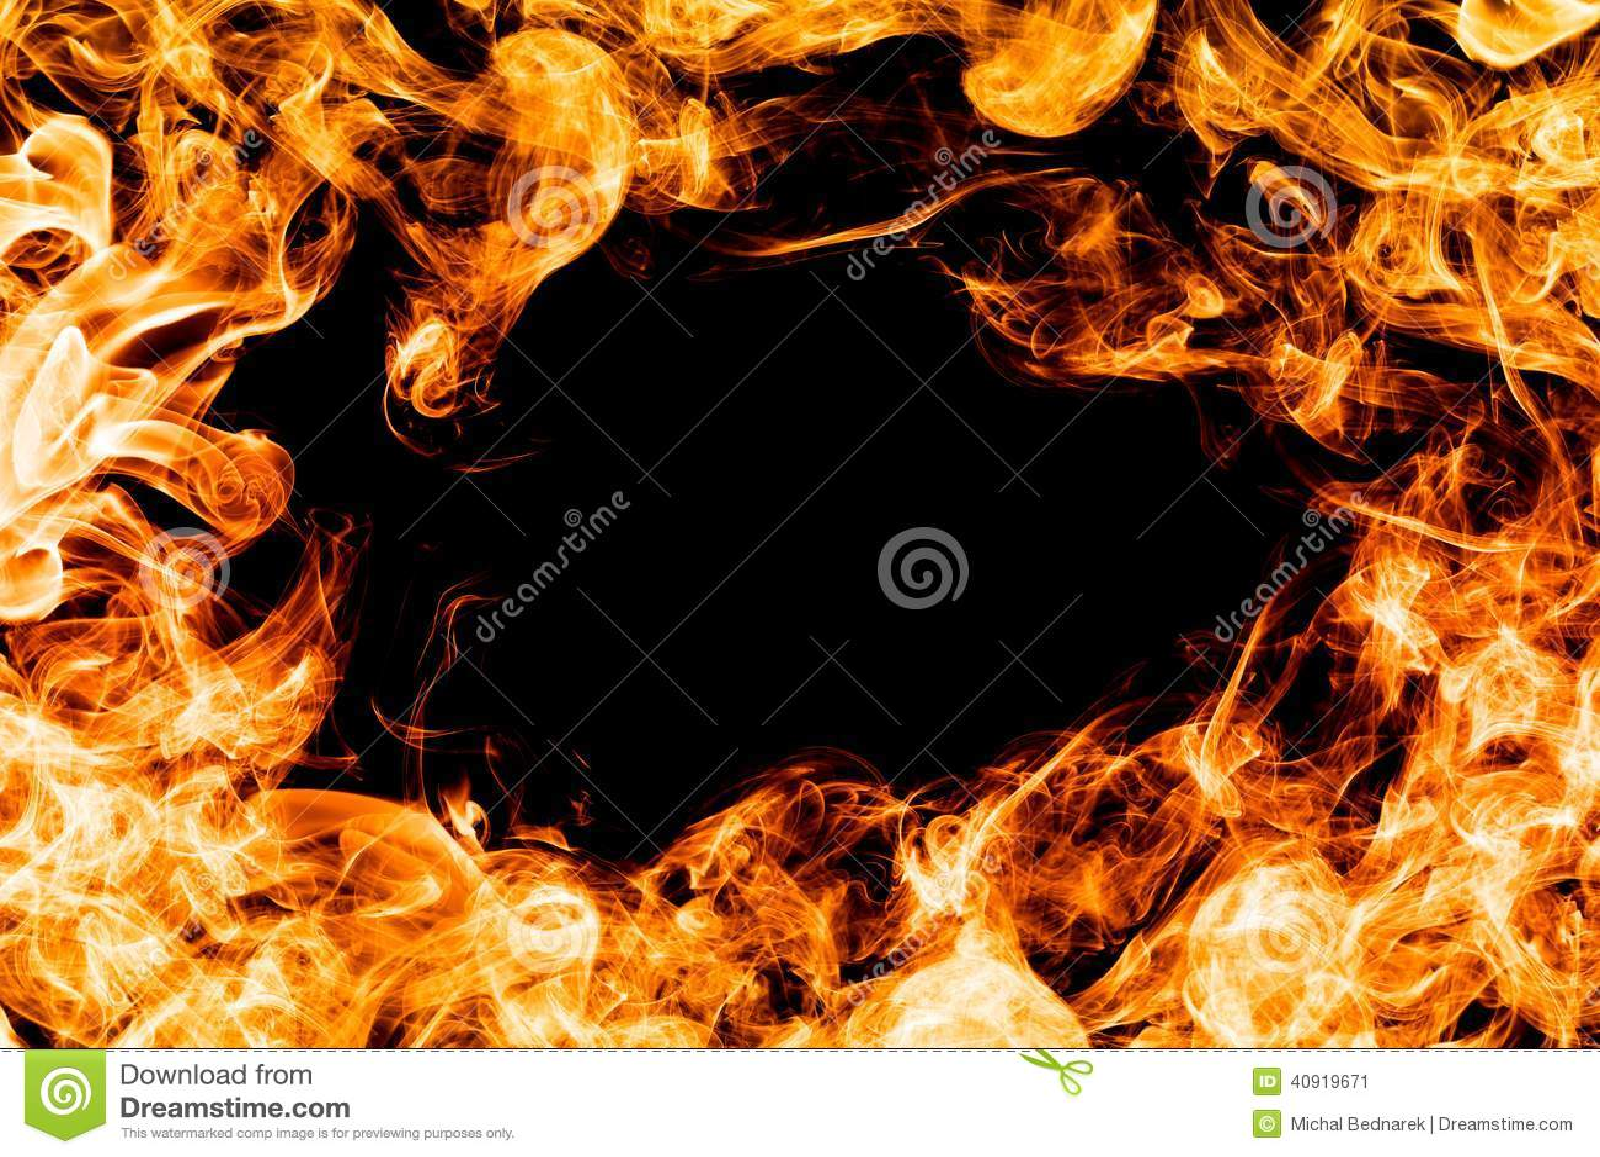 fire flames on black background frame border stock